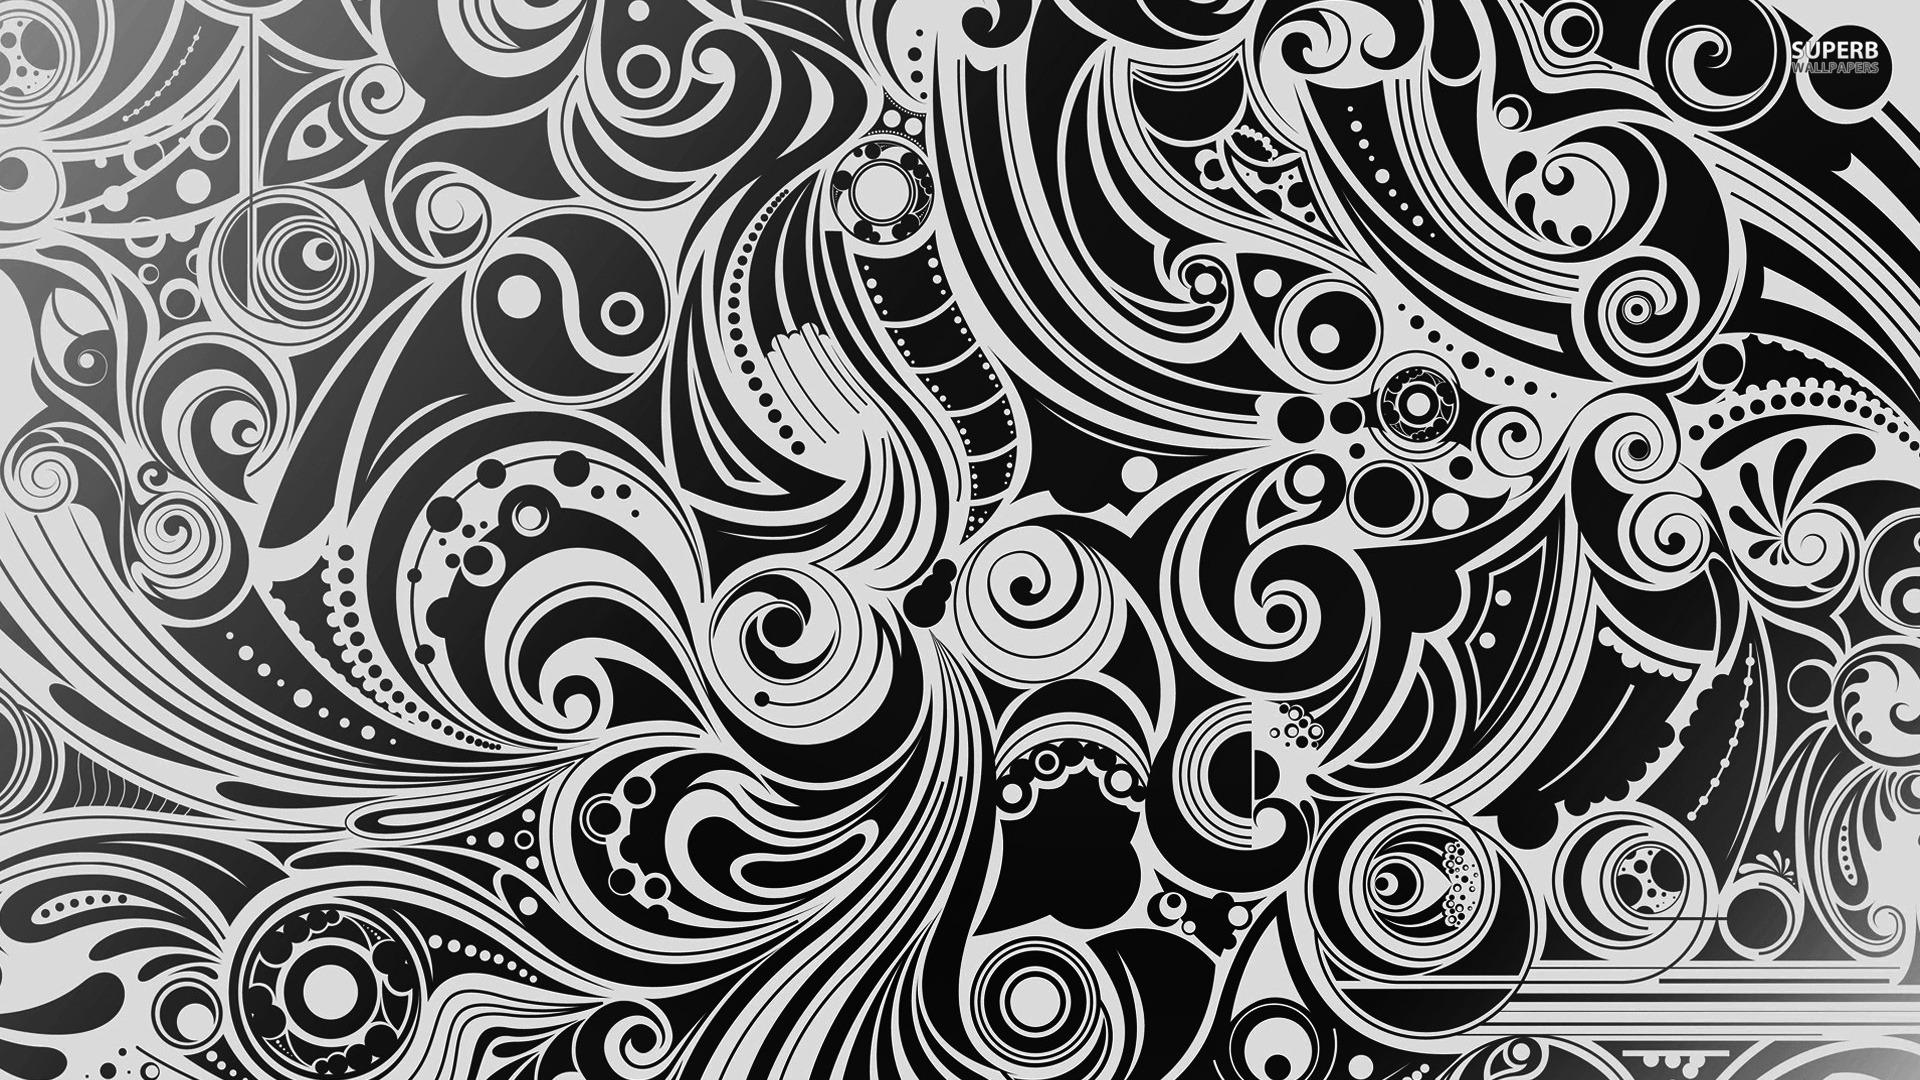 Graffiti Black And White 995822 Hd Wallpaper Backgrounds